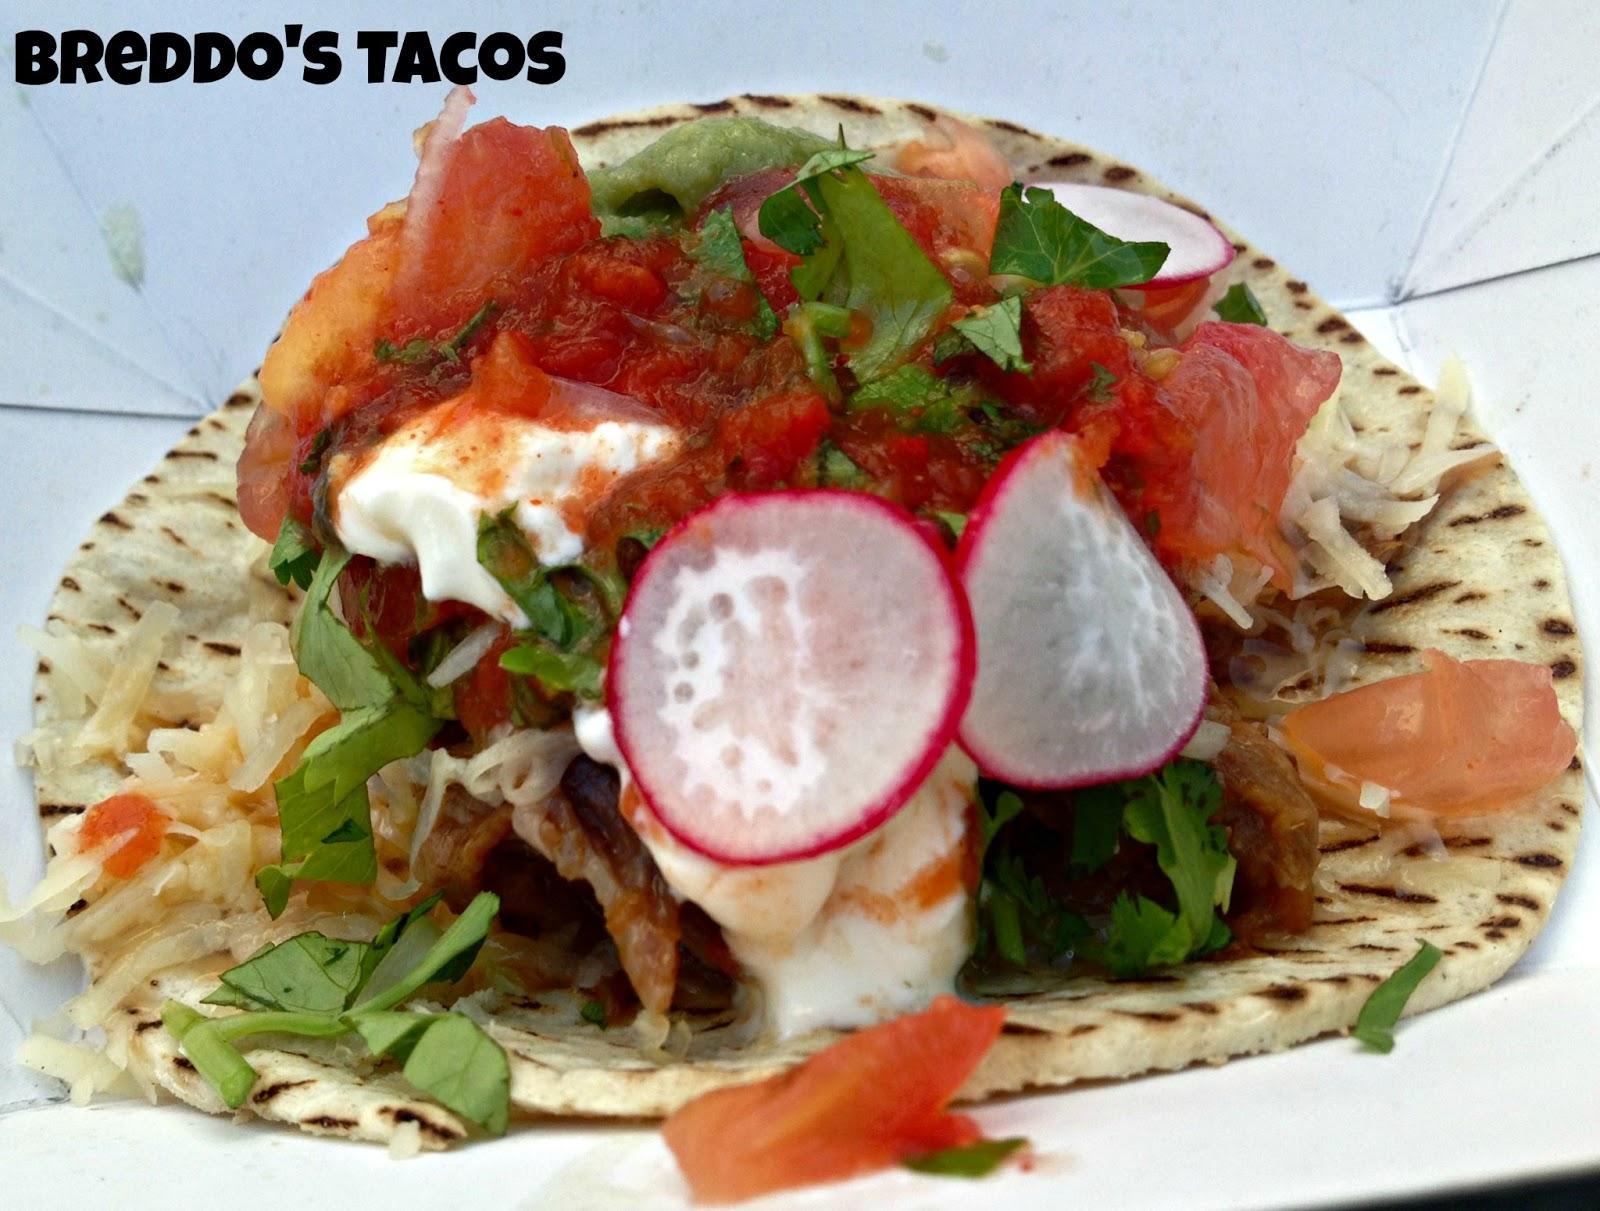 Breddo's Tacos